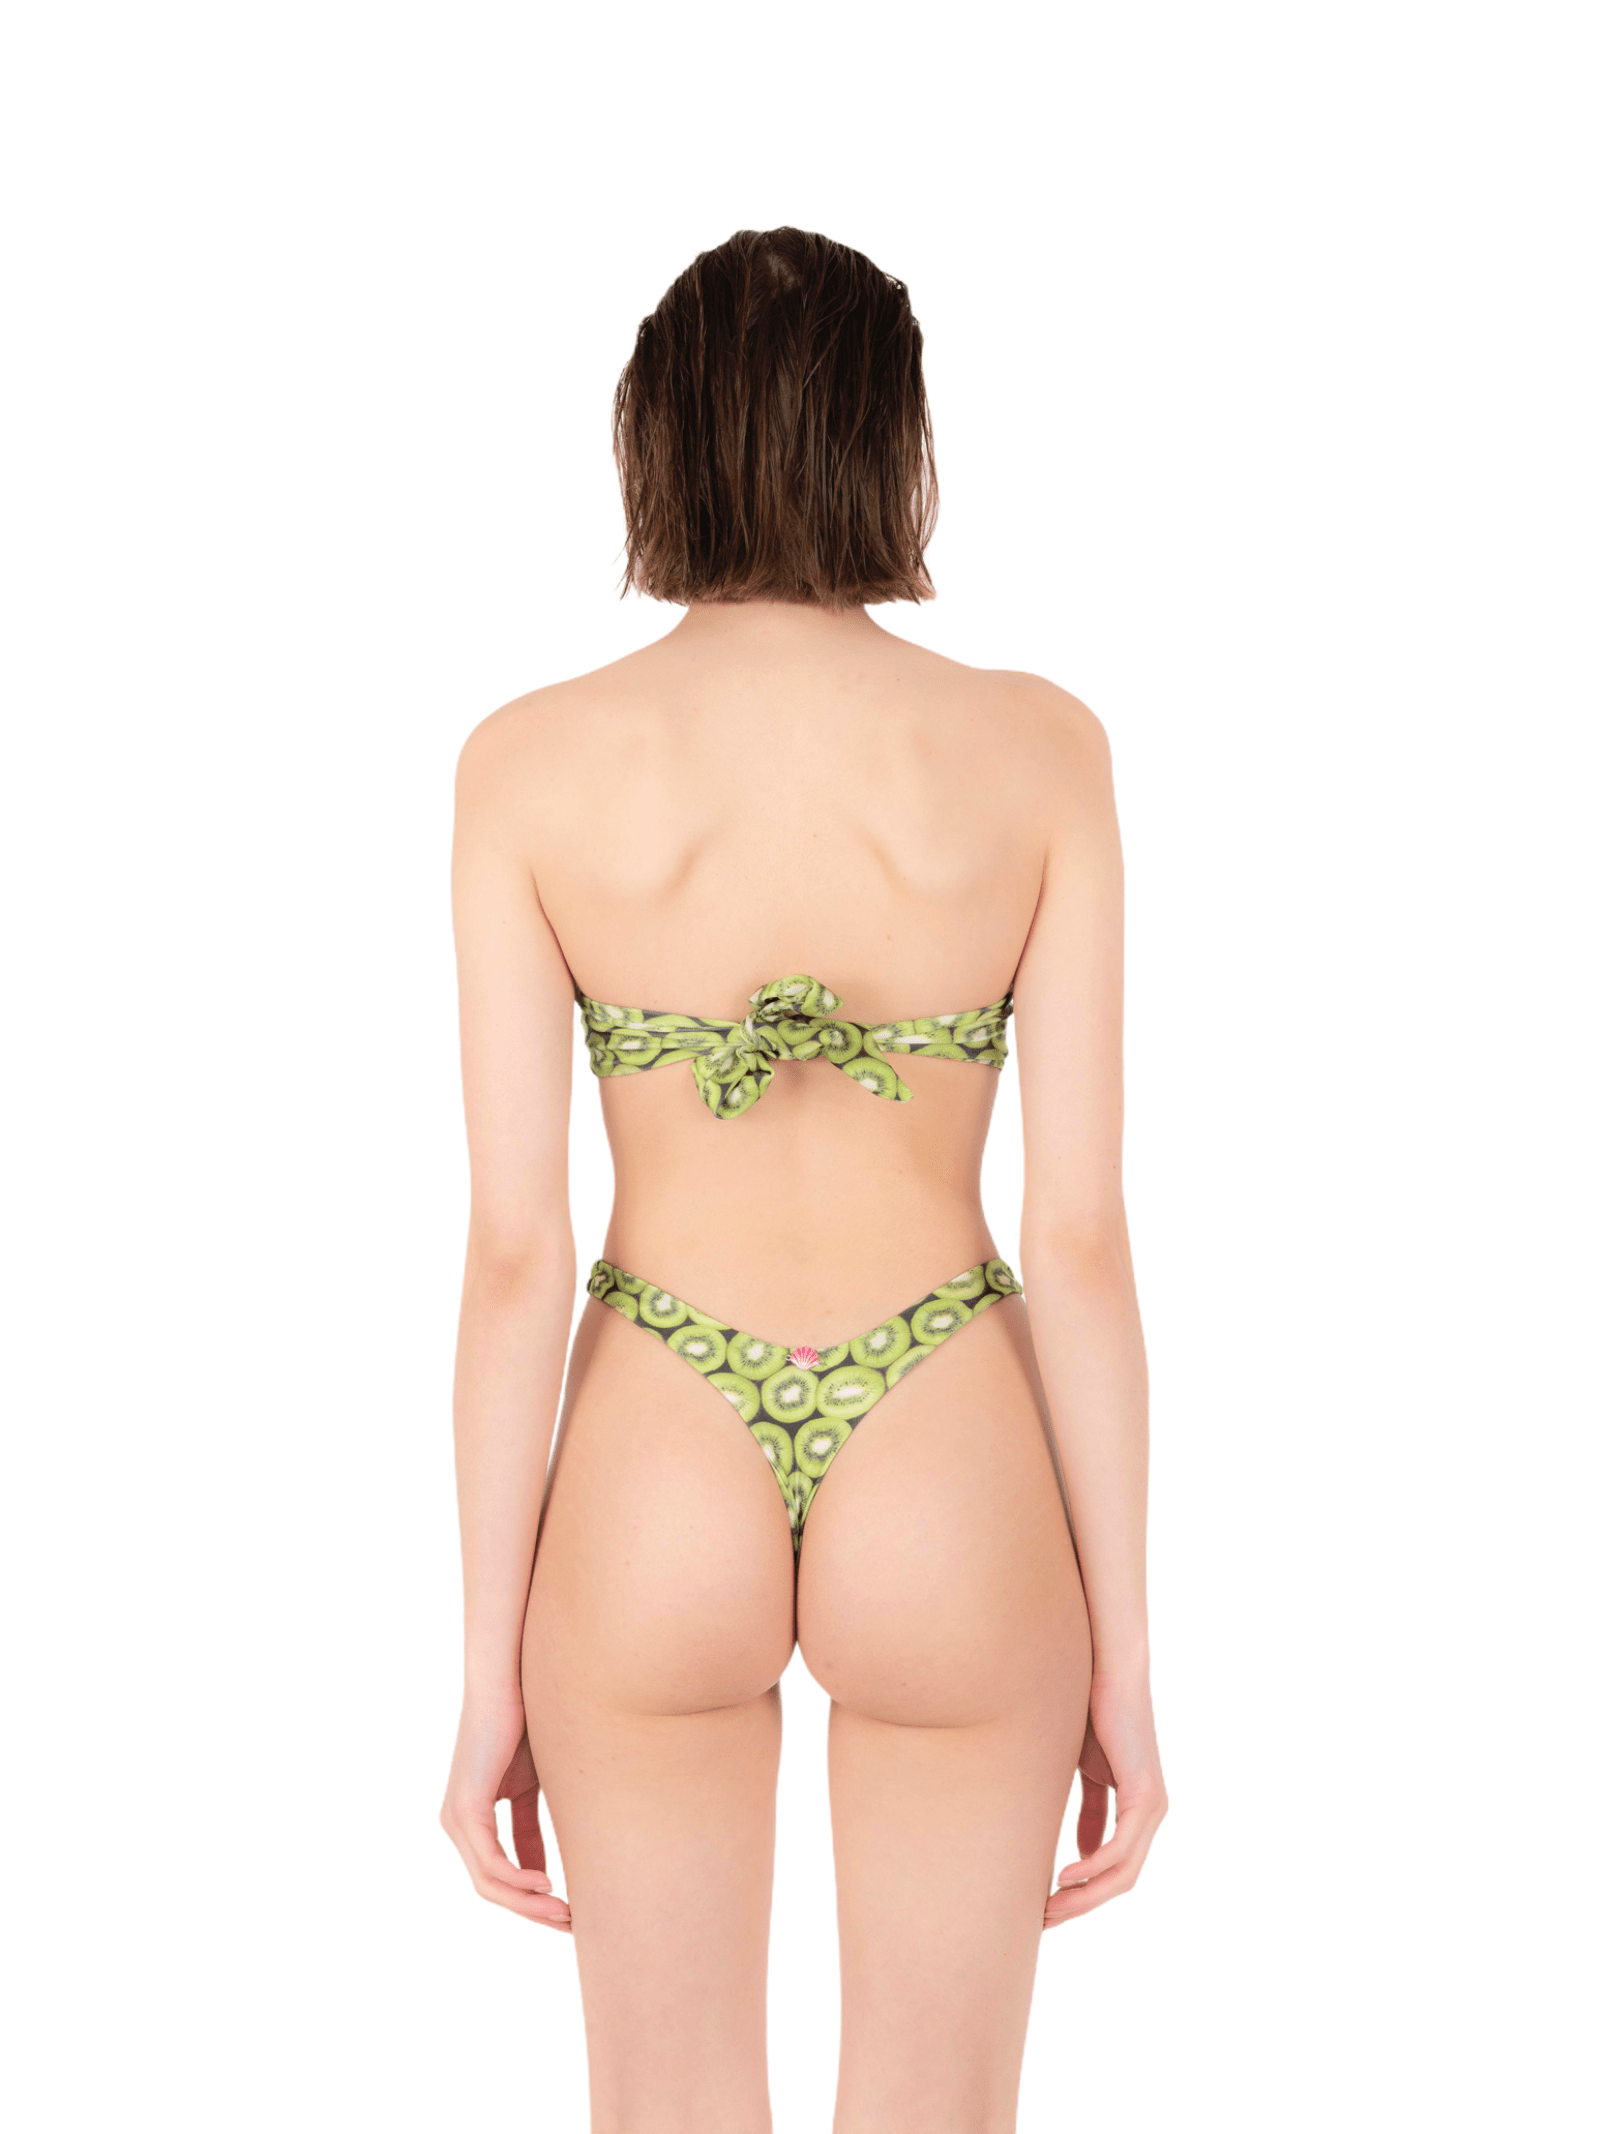 Bikini top shell with thong ANNAMARE | 23 | BK-120VERDE